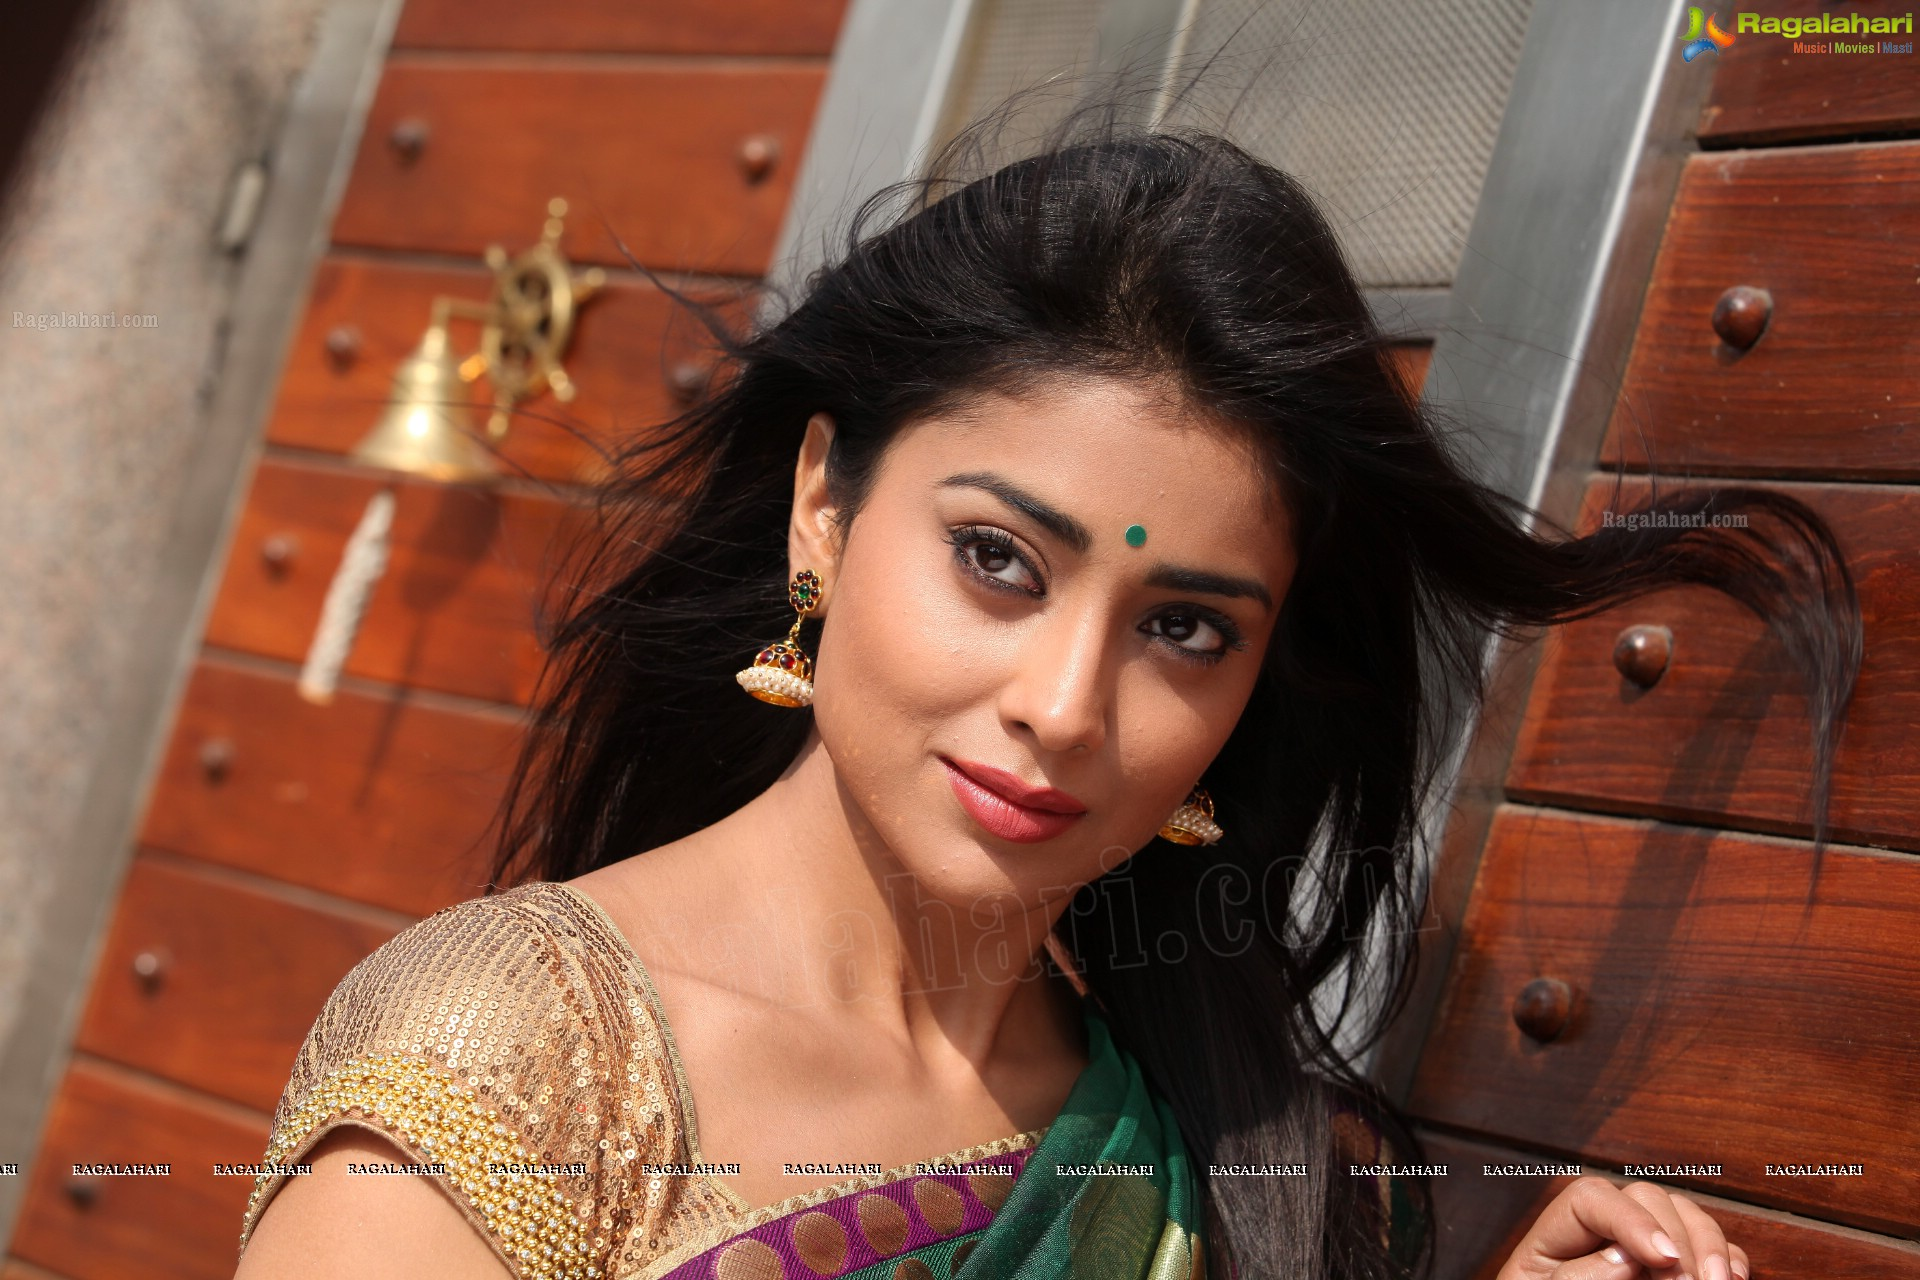 shriya saran (high definition) image 27 | tollywood actor gallery